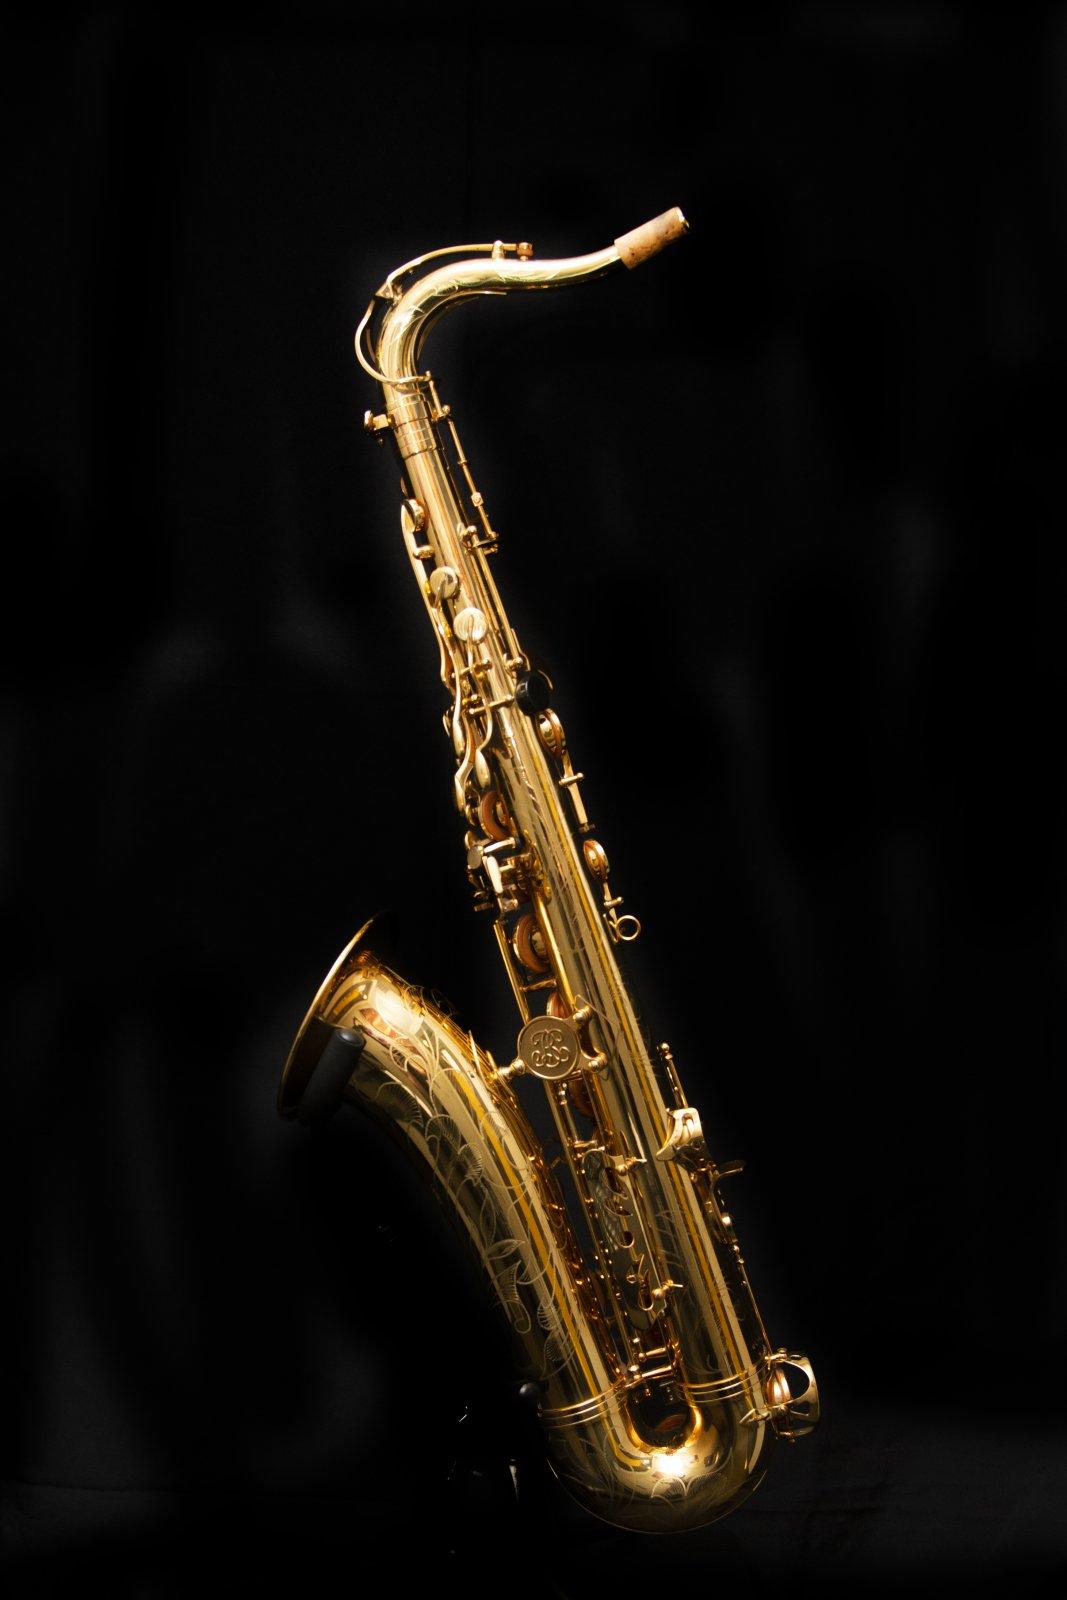 Outstanding Buffet Crampon 400 Series Professional Tenor Saxophone Download Free Architecture Designs Intelgarnamadebymaigaardcom